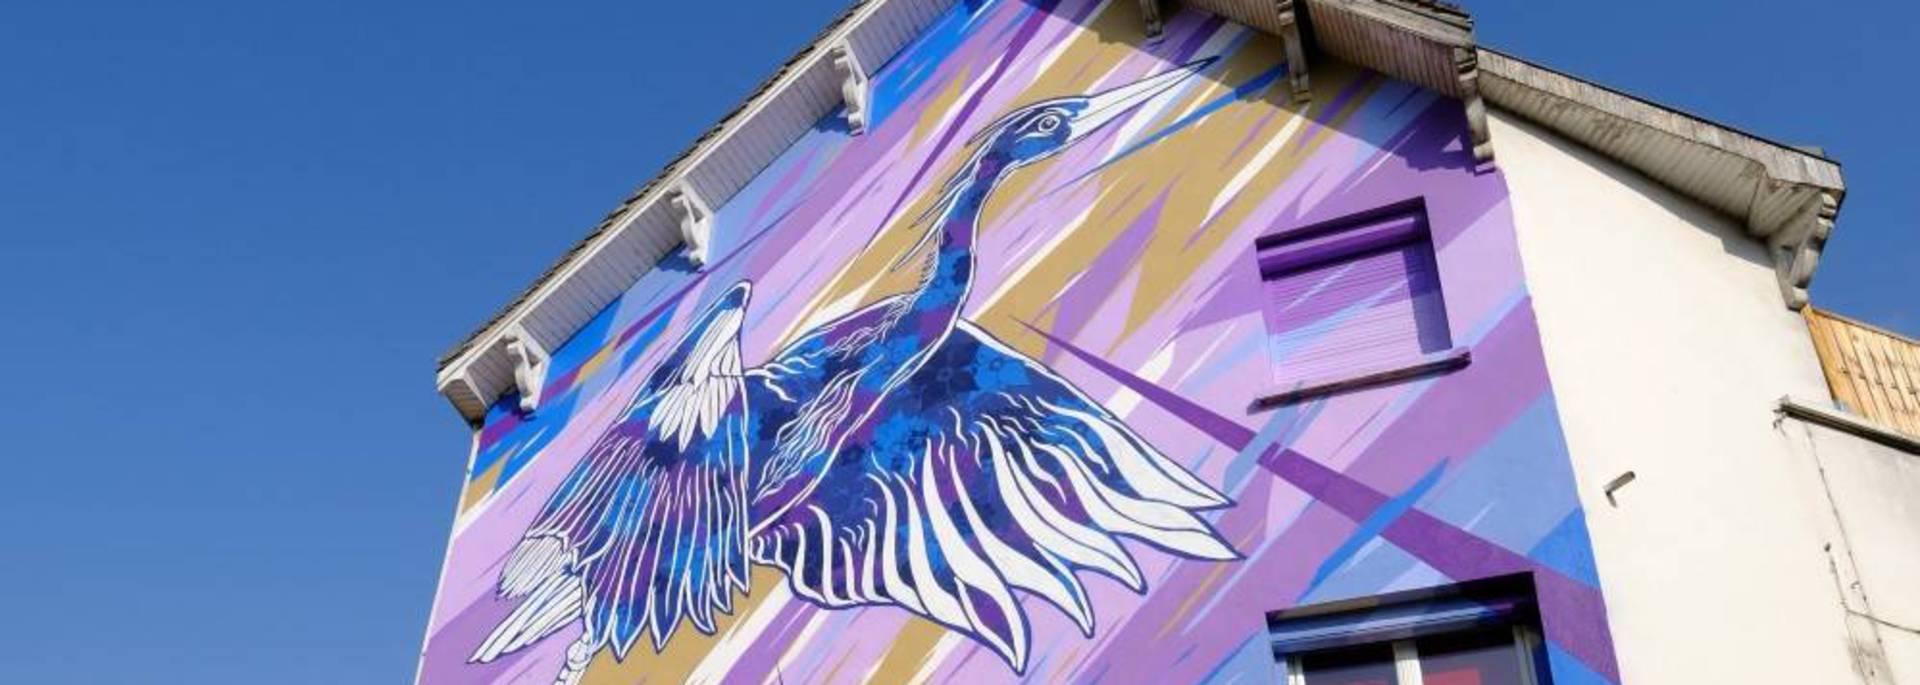 Oeuvre de street art à Chartres